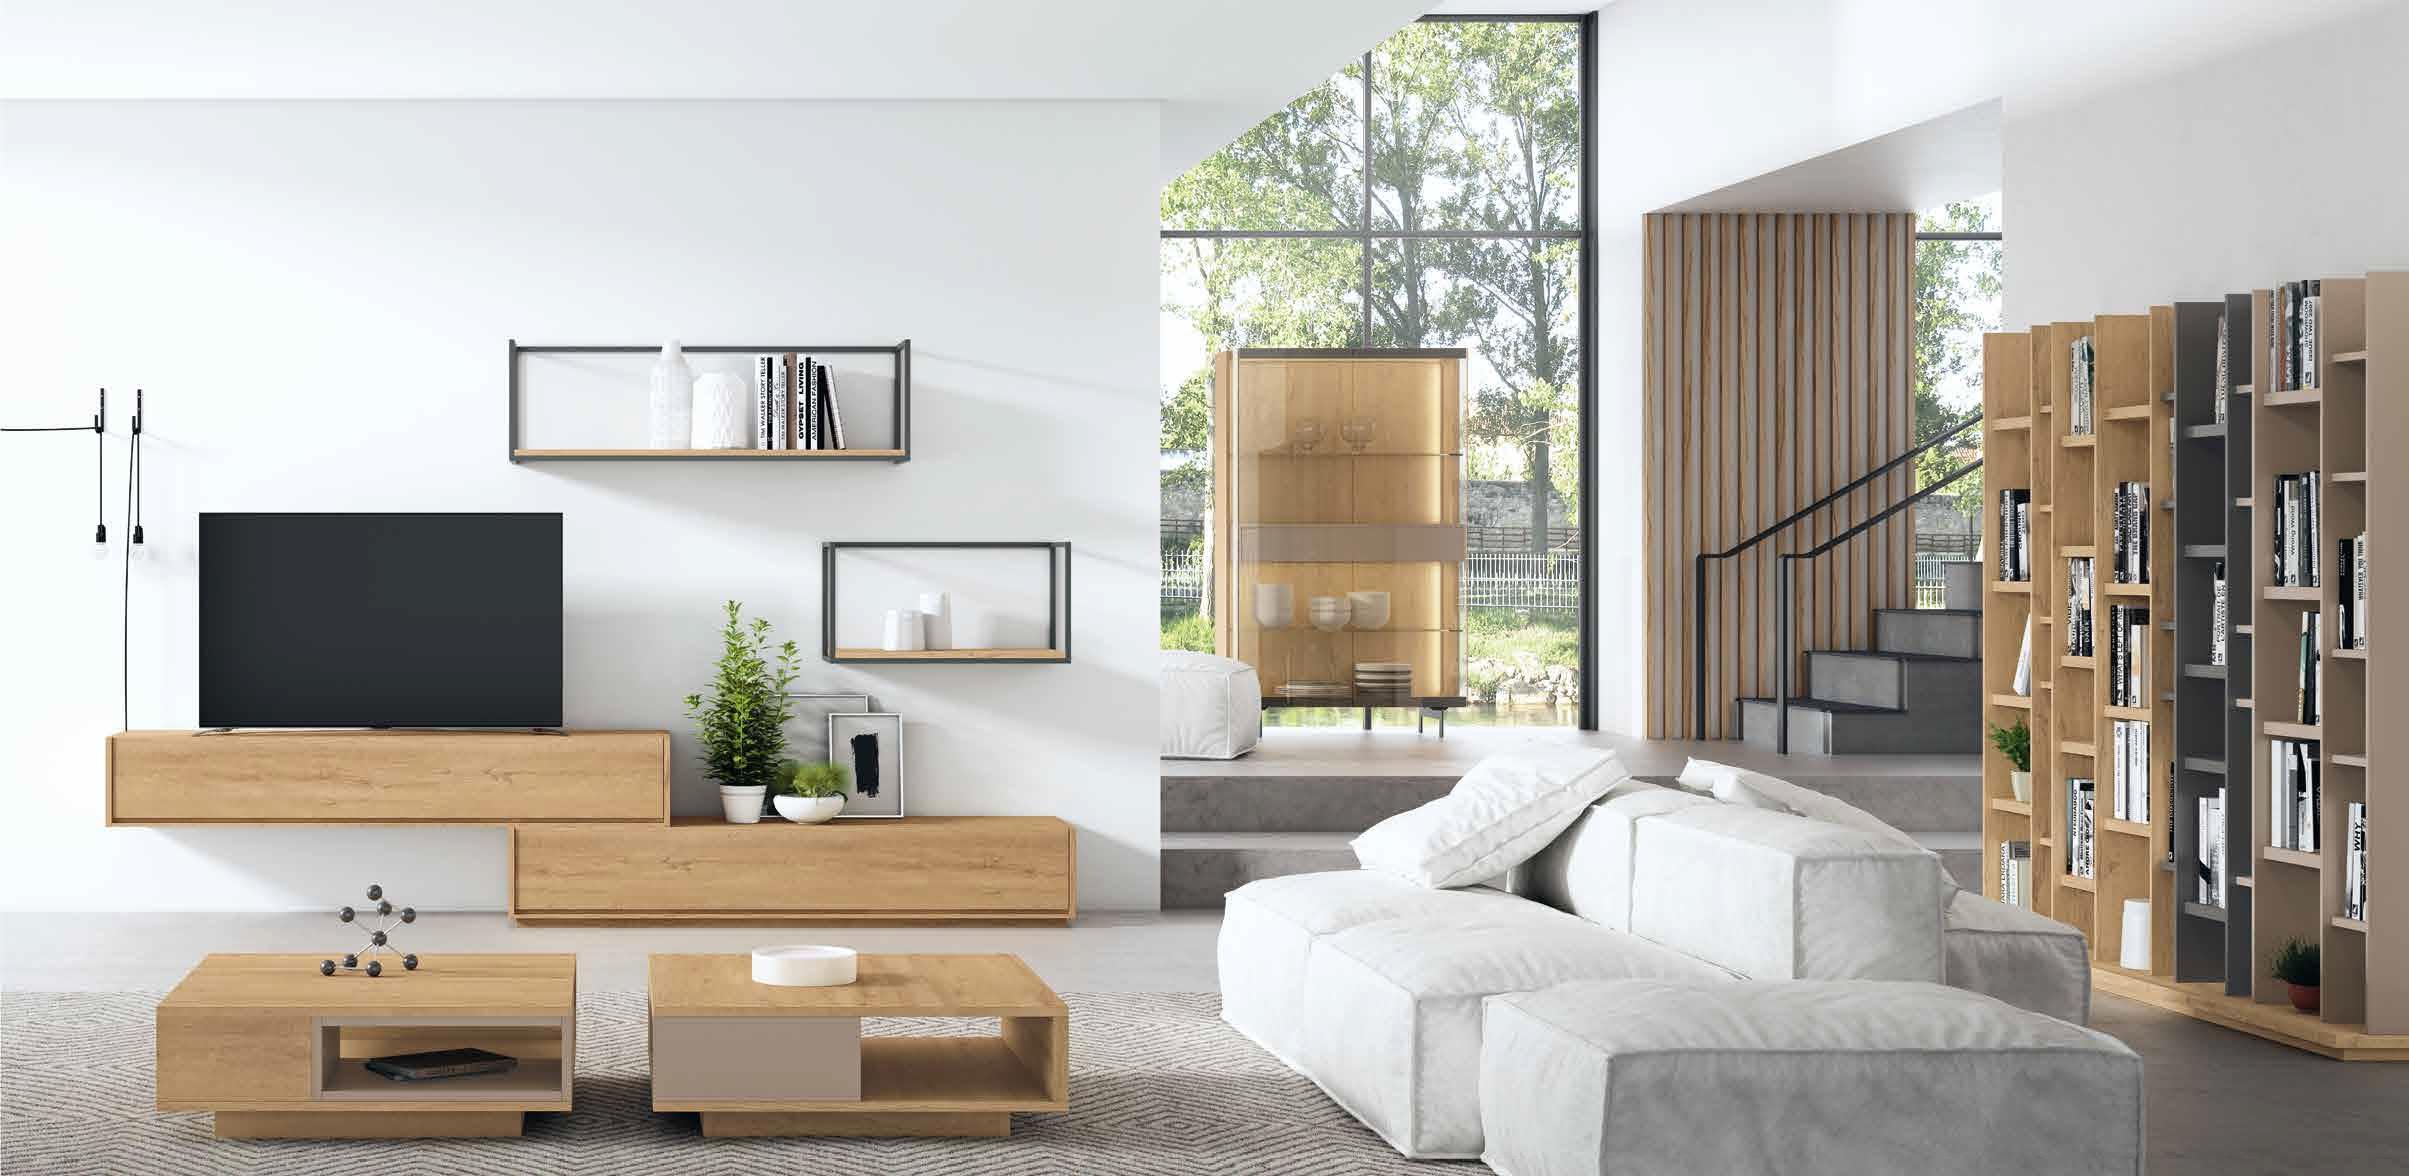 salon-moderno-Nativ-2019-muebles-paco-caballero-0920-5c8cea95d7d57